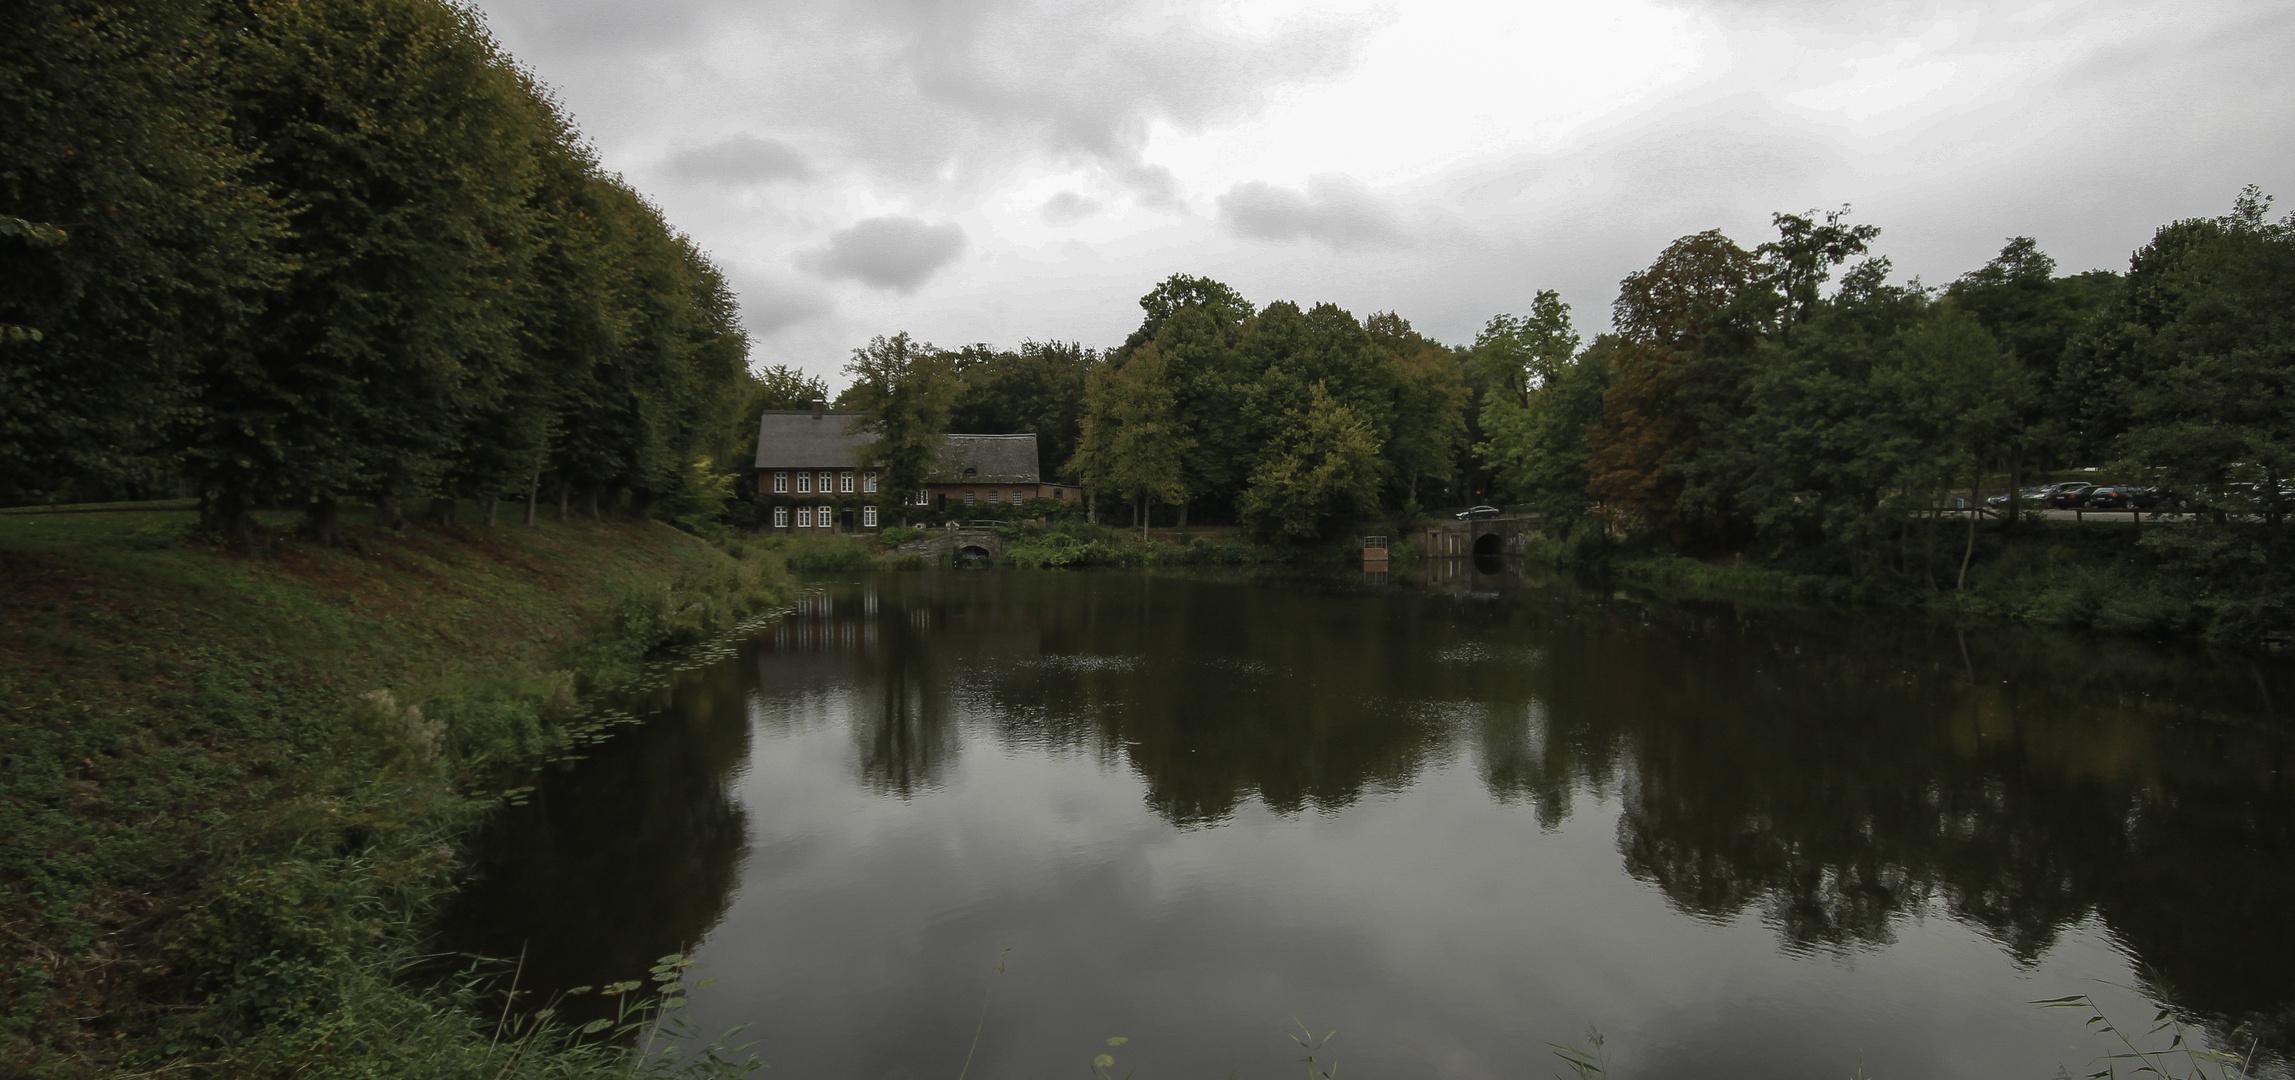 Schlossgraben Ahrensburg